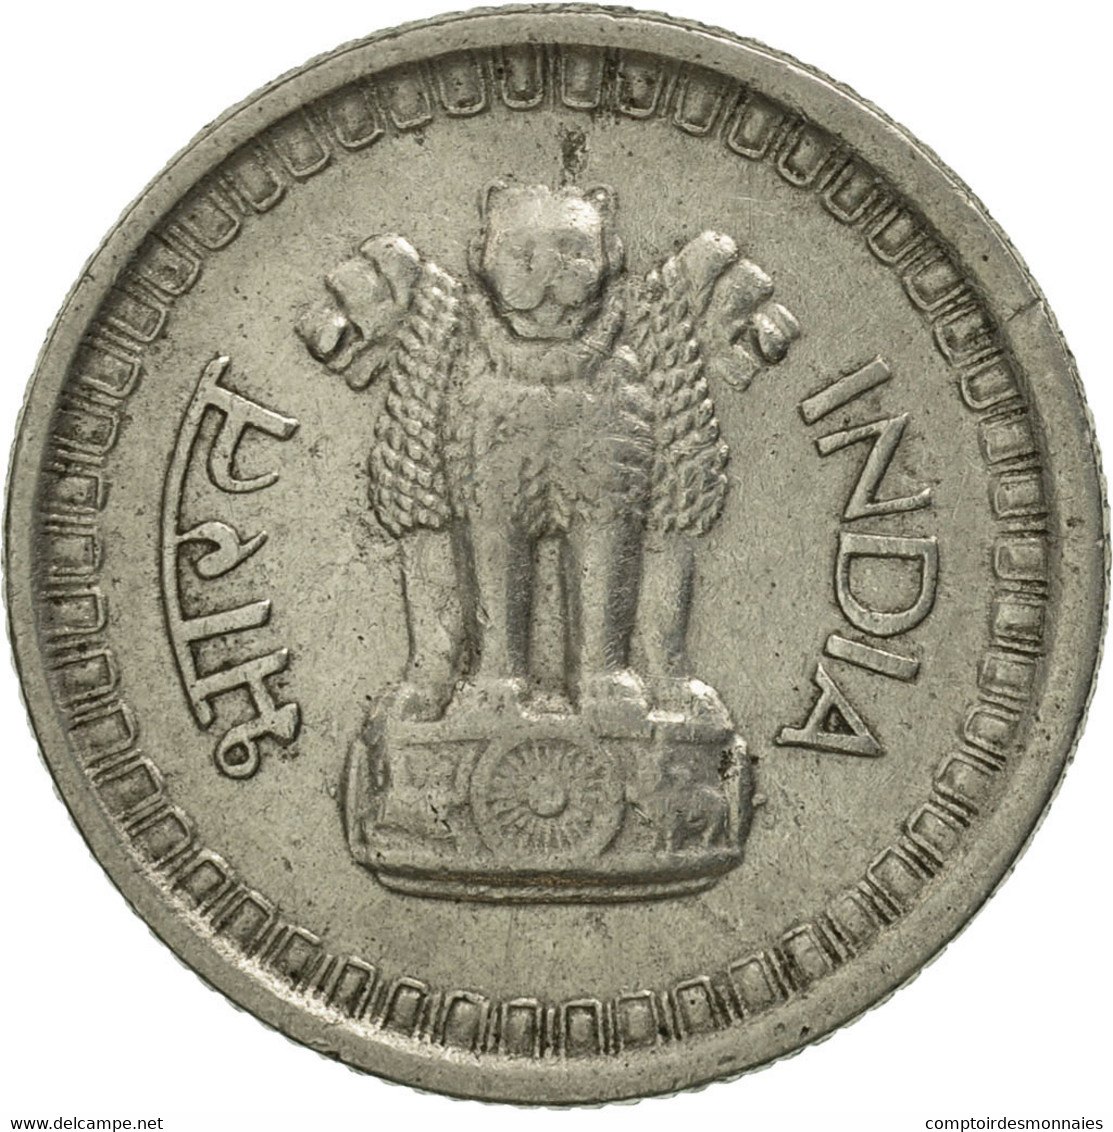 INDIA-REPUBLIC, 25 Naye Paise, 1960, SUP+, Nickel, KM:47.1 - Inde